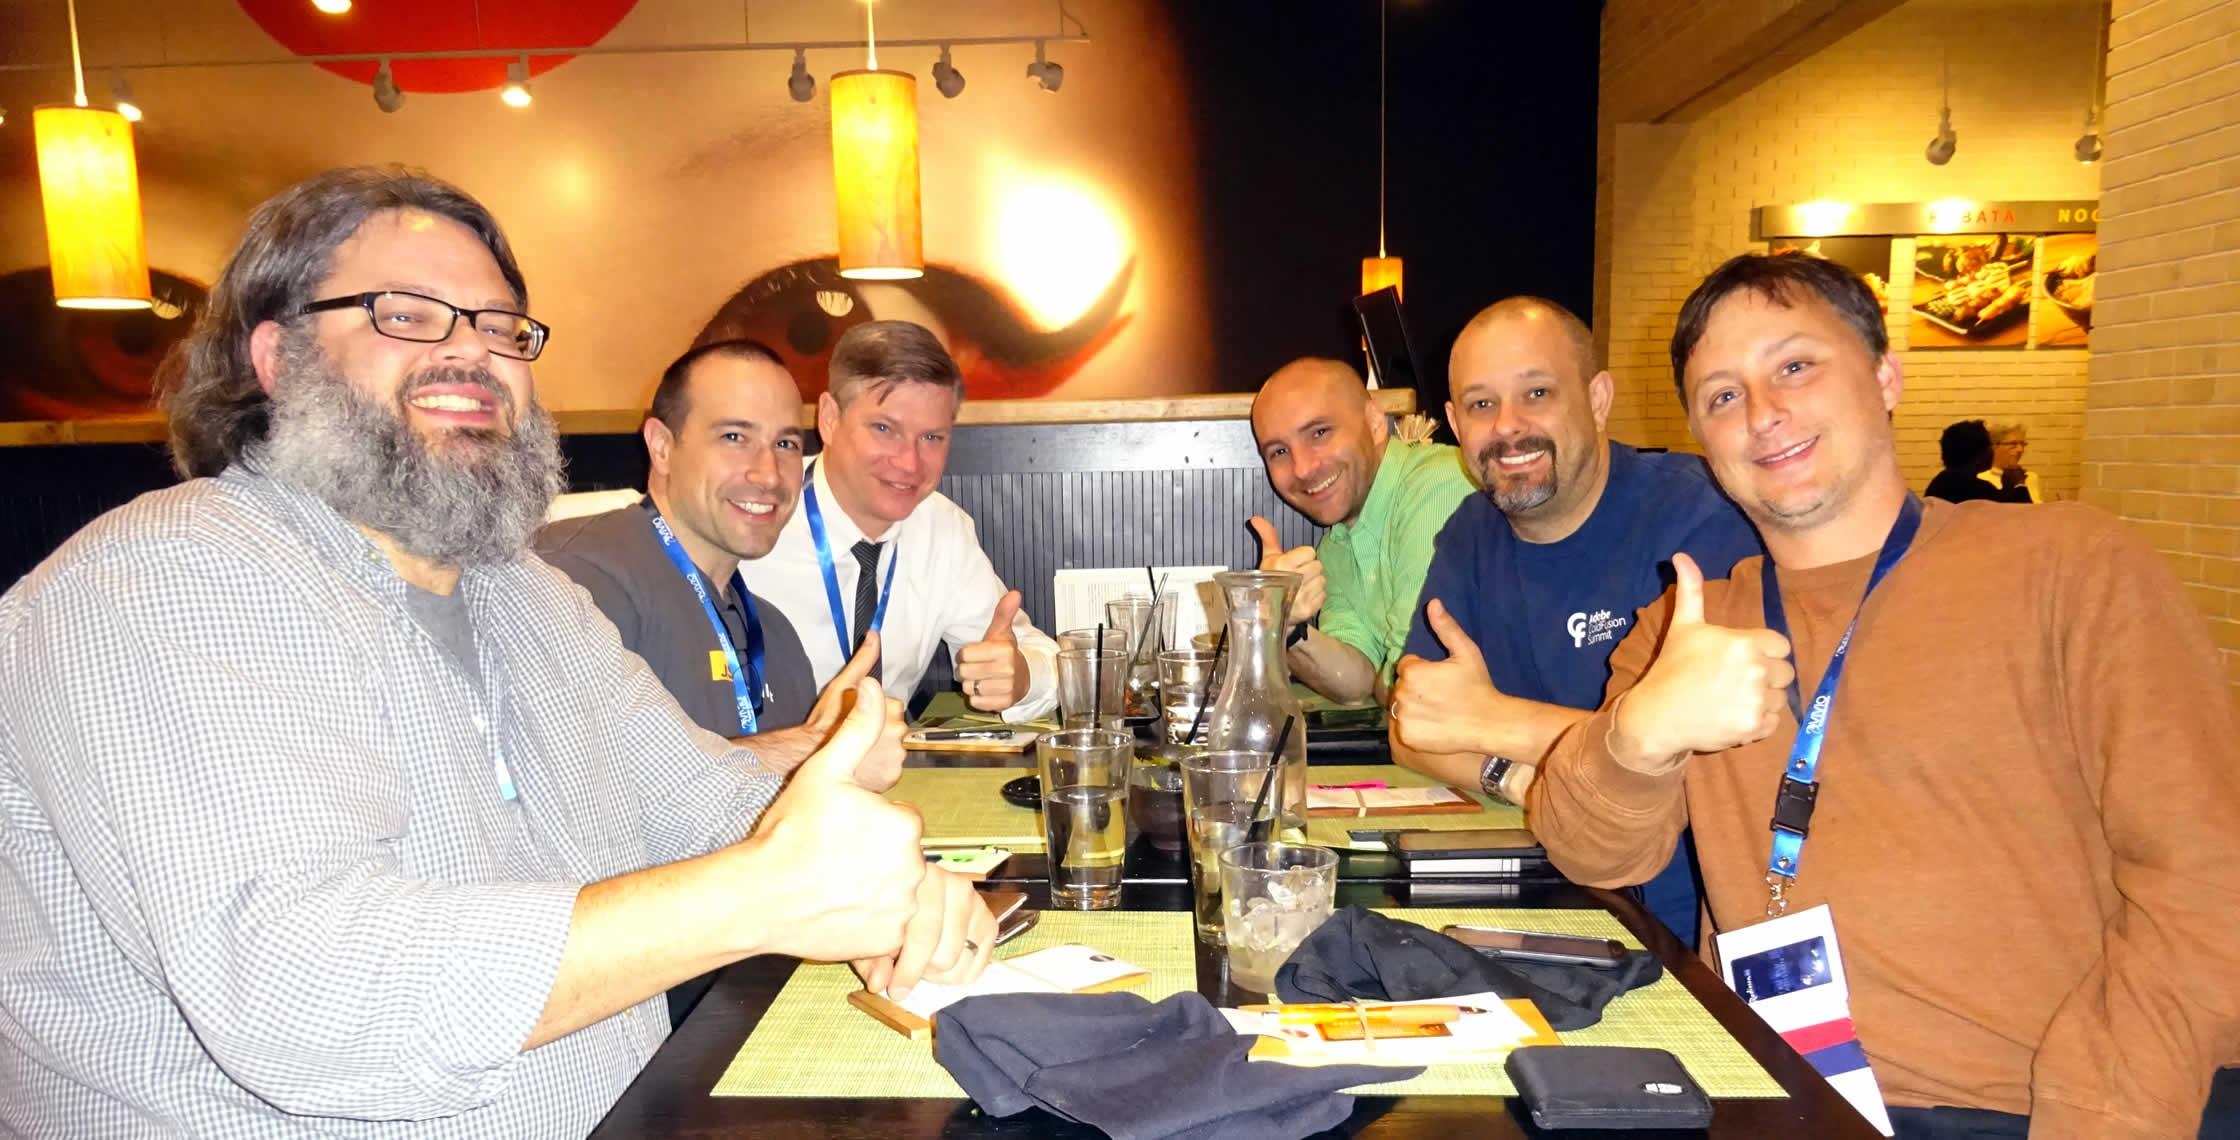 Ben Nadel at dev.Objective() 2015 (Bloomington, MN) with: Andy Matthews, Tim Cunningham, Matt Gifford, Dave Ferguson, and Dan Wilson